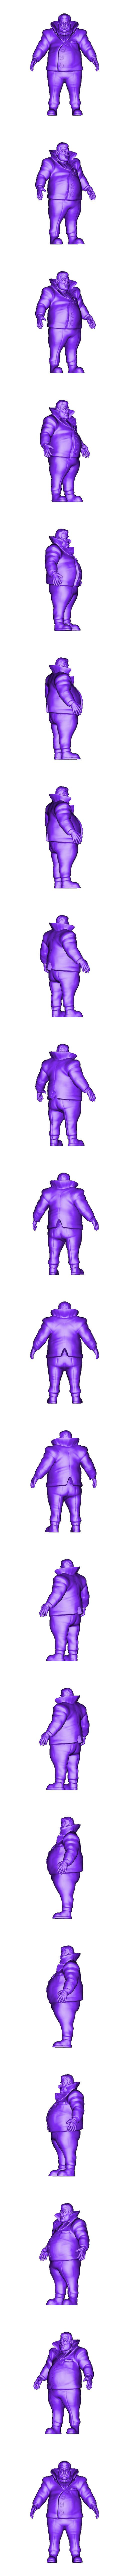 big boy.stl Download STL file Serpent Big Boss with Commercial Option. • 3D printer model, TFG